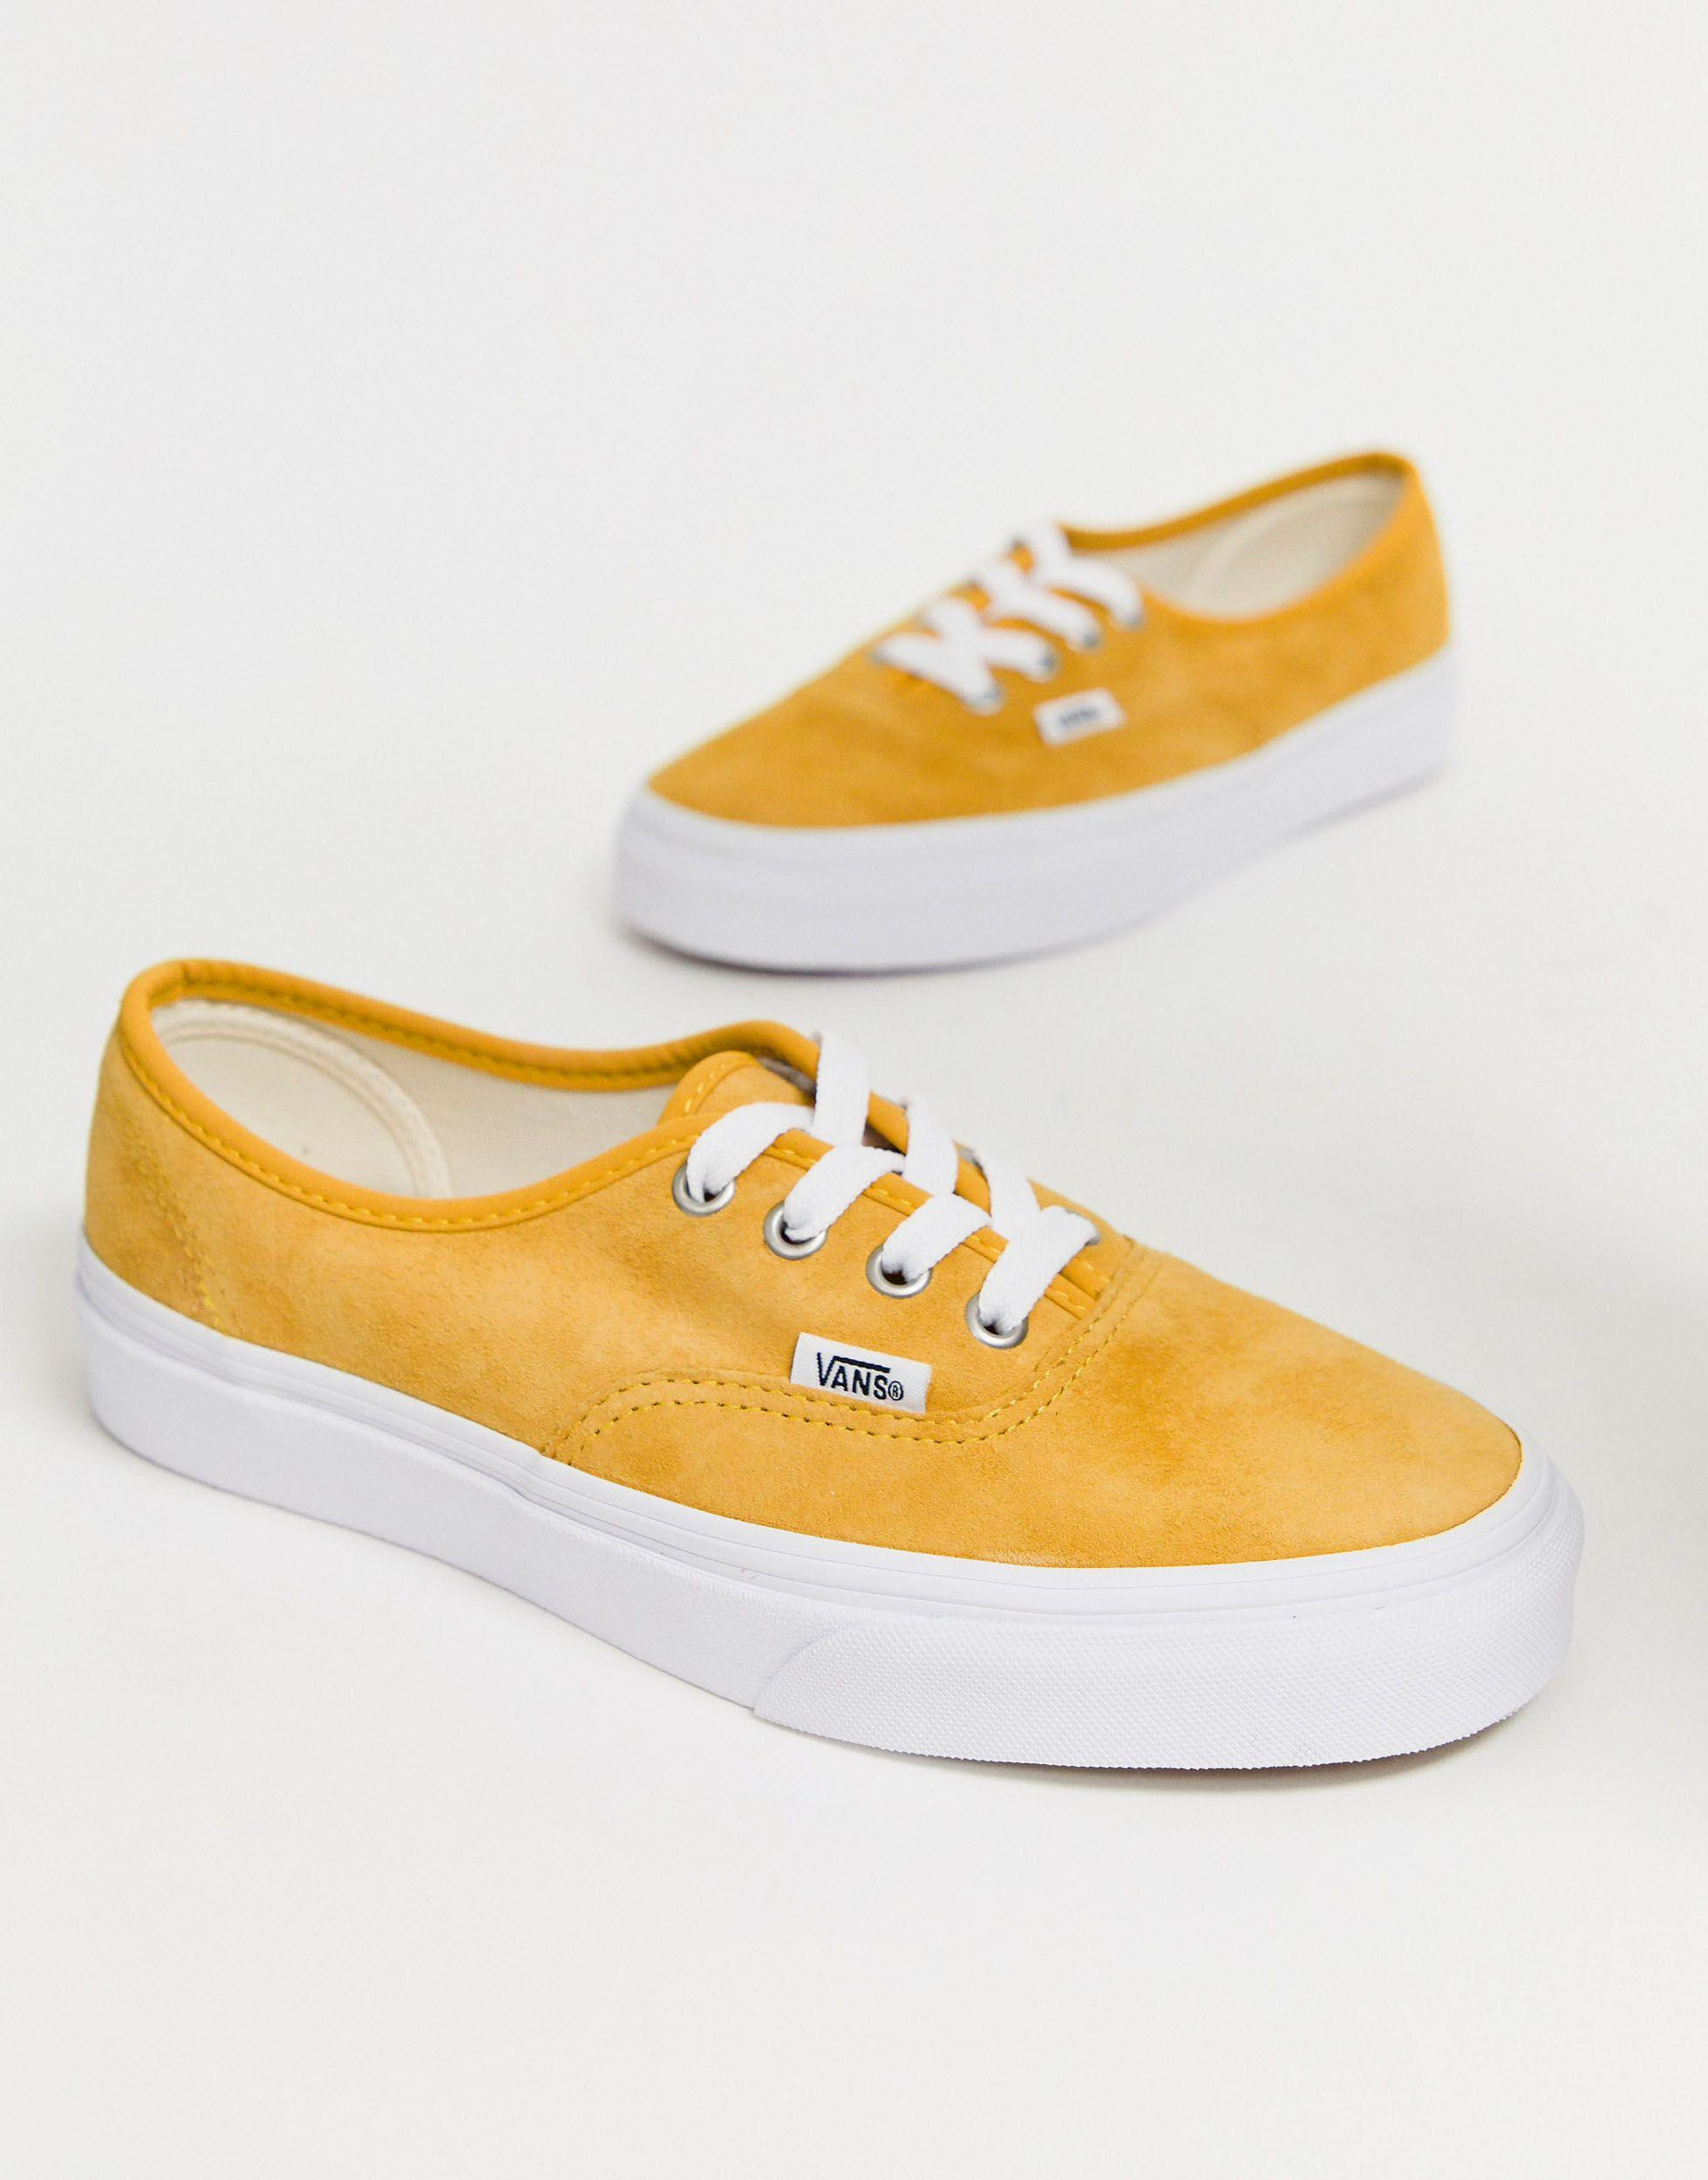 Vans Authentic Mustard Suede Trainers